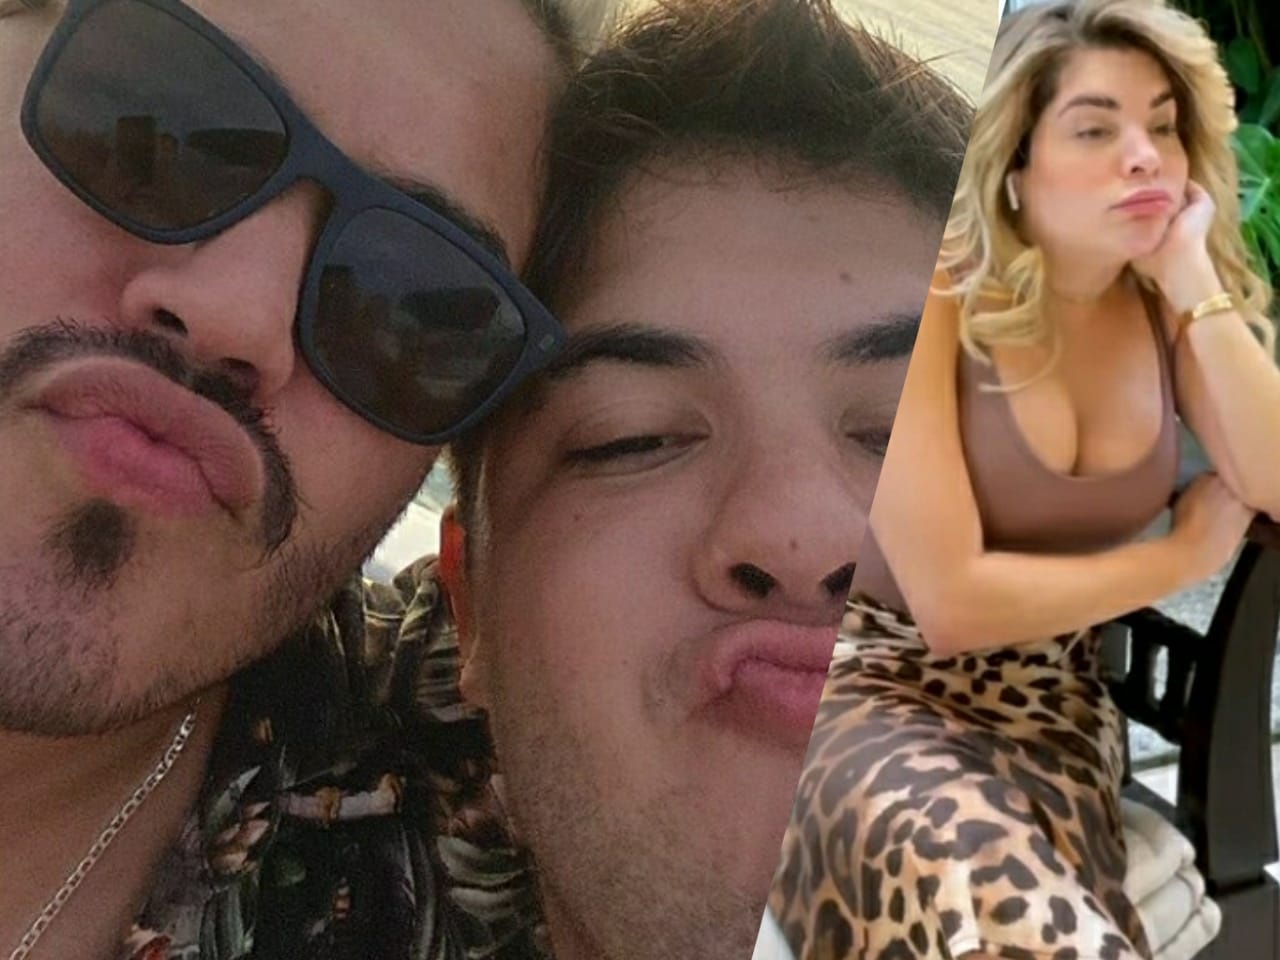 Gkay critica Alvaro após início de namoro: 'Trocou os amigos'